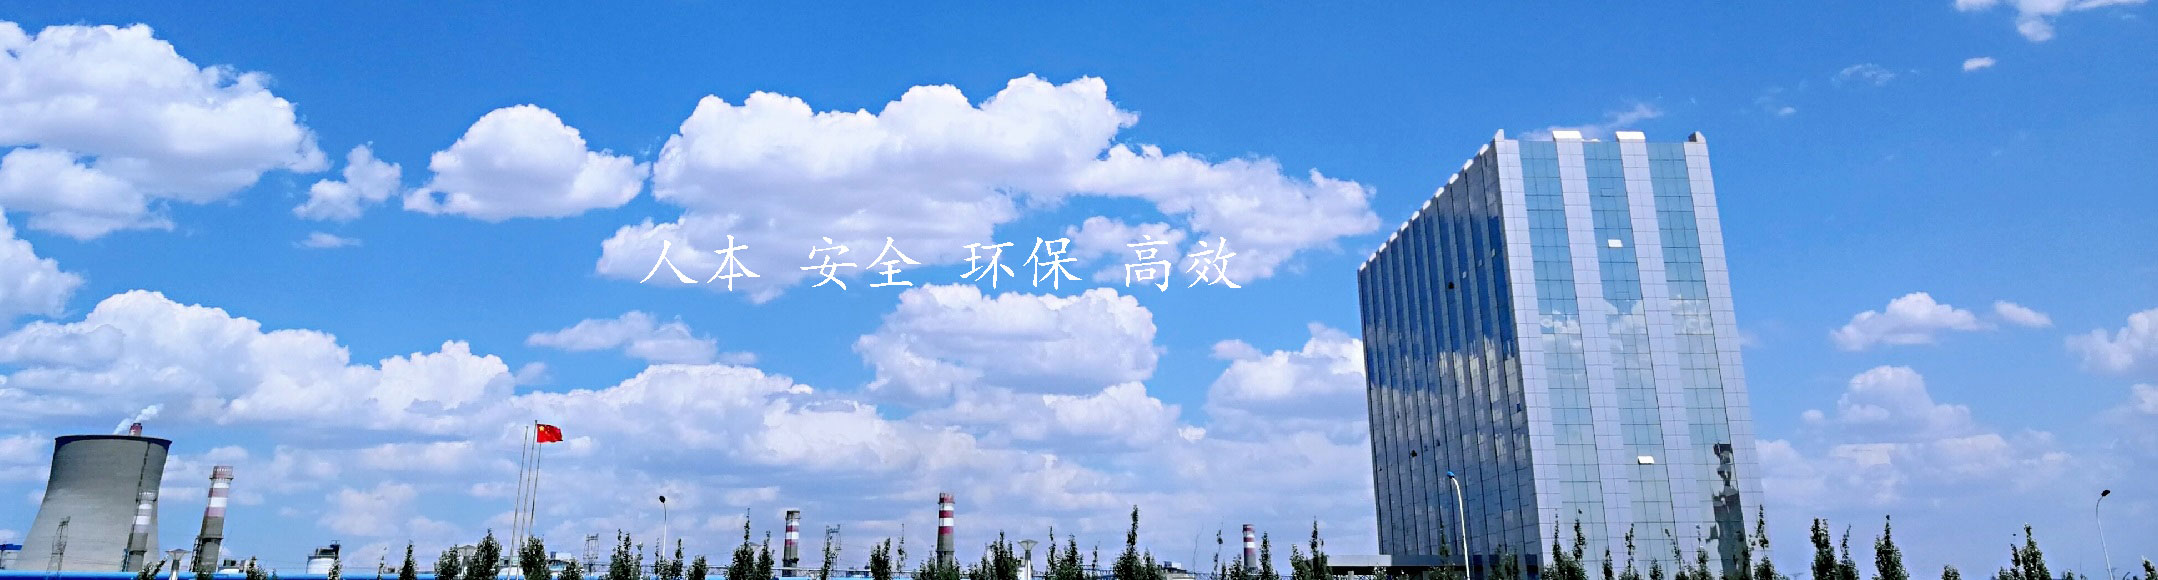 banner新疆yabovip